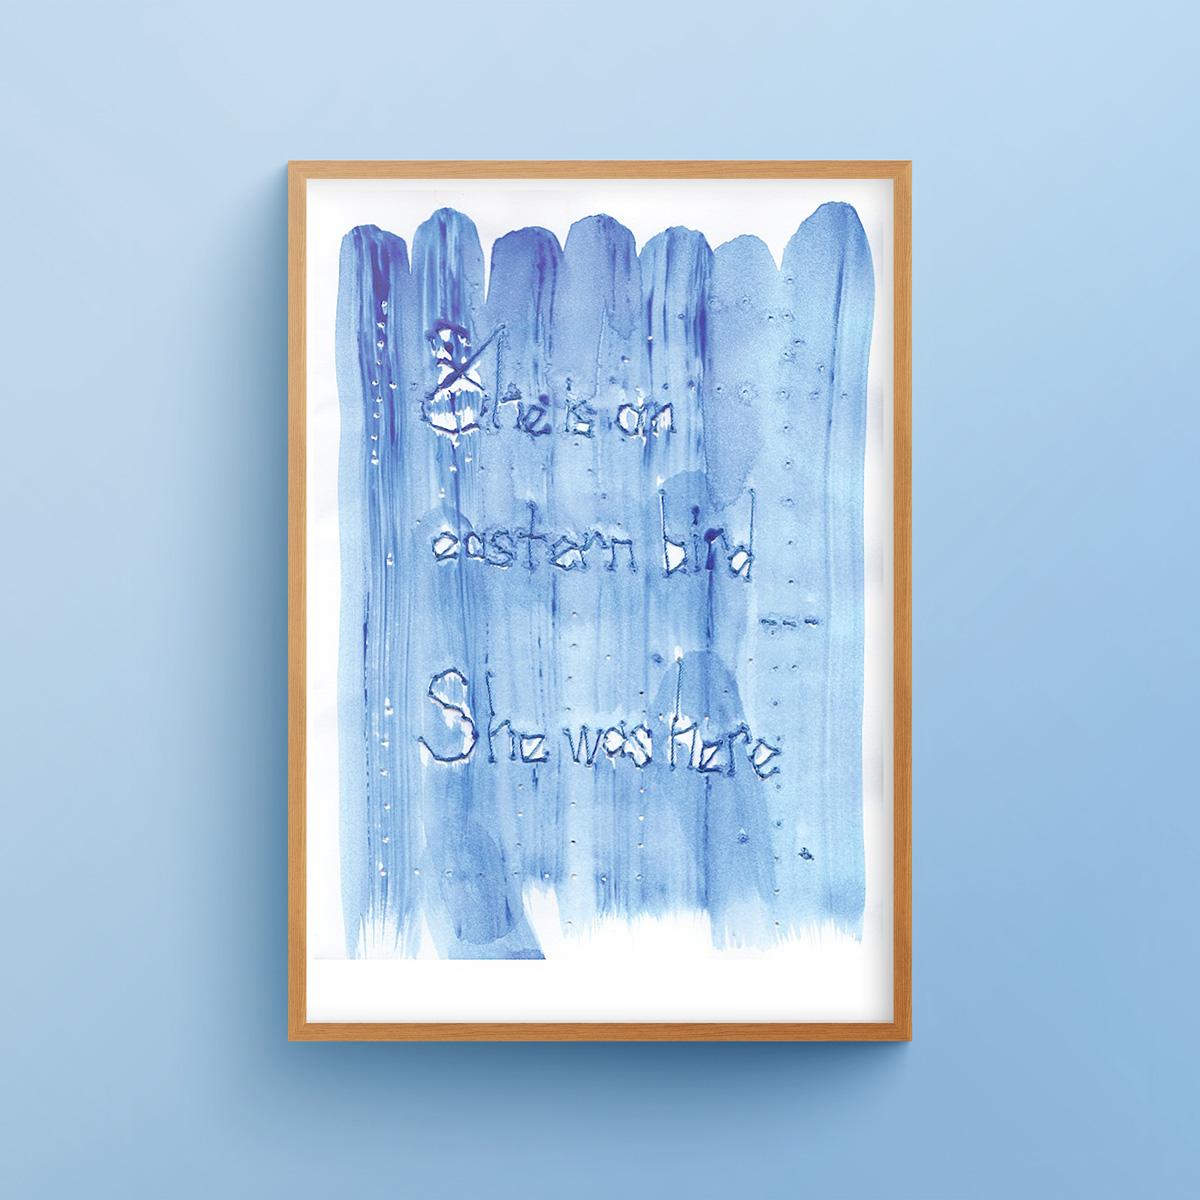 """She is an Eastern Bird 2"" art print in a wooden frame"